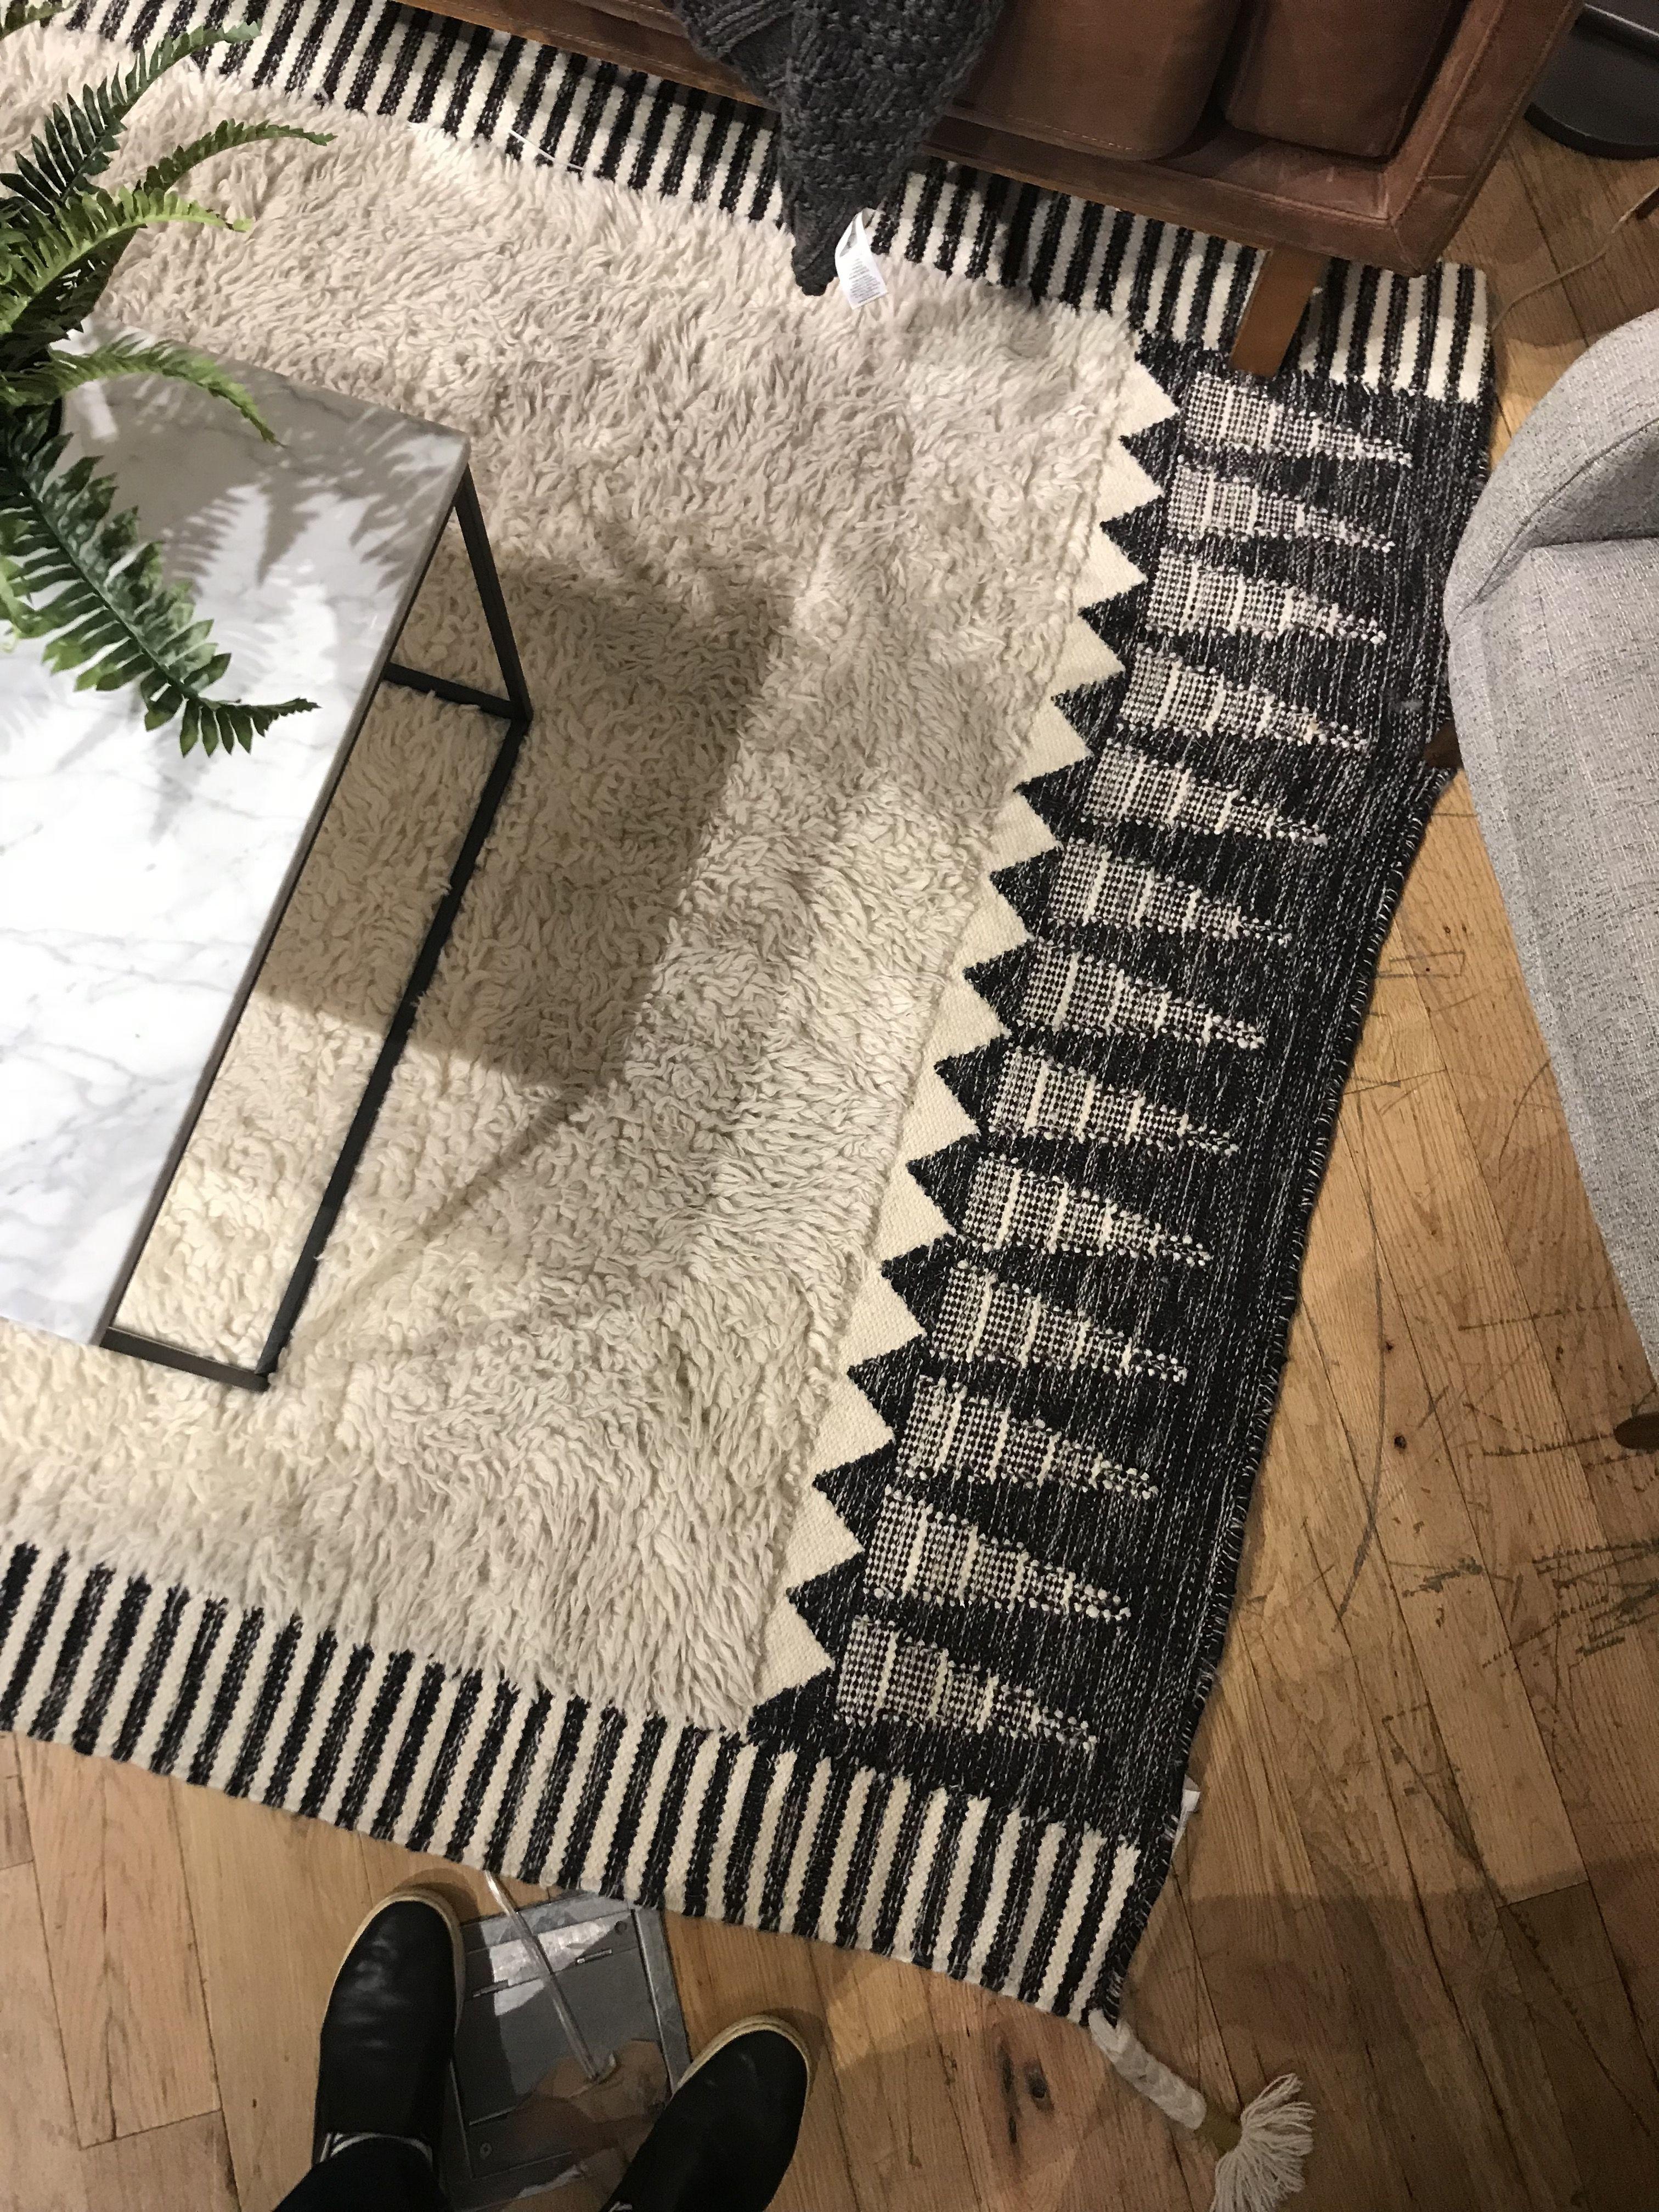 Pin By Grace Kang Pink Olive On Ear Piercings In 2020 Rugs Rugs On Carpet Animal Print Rug